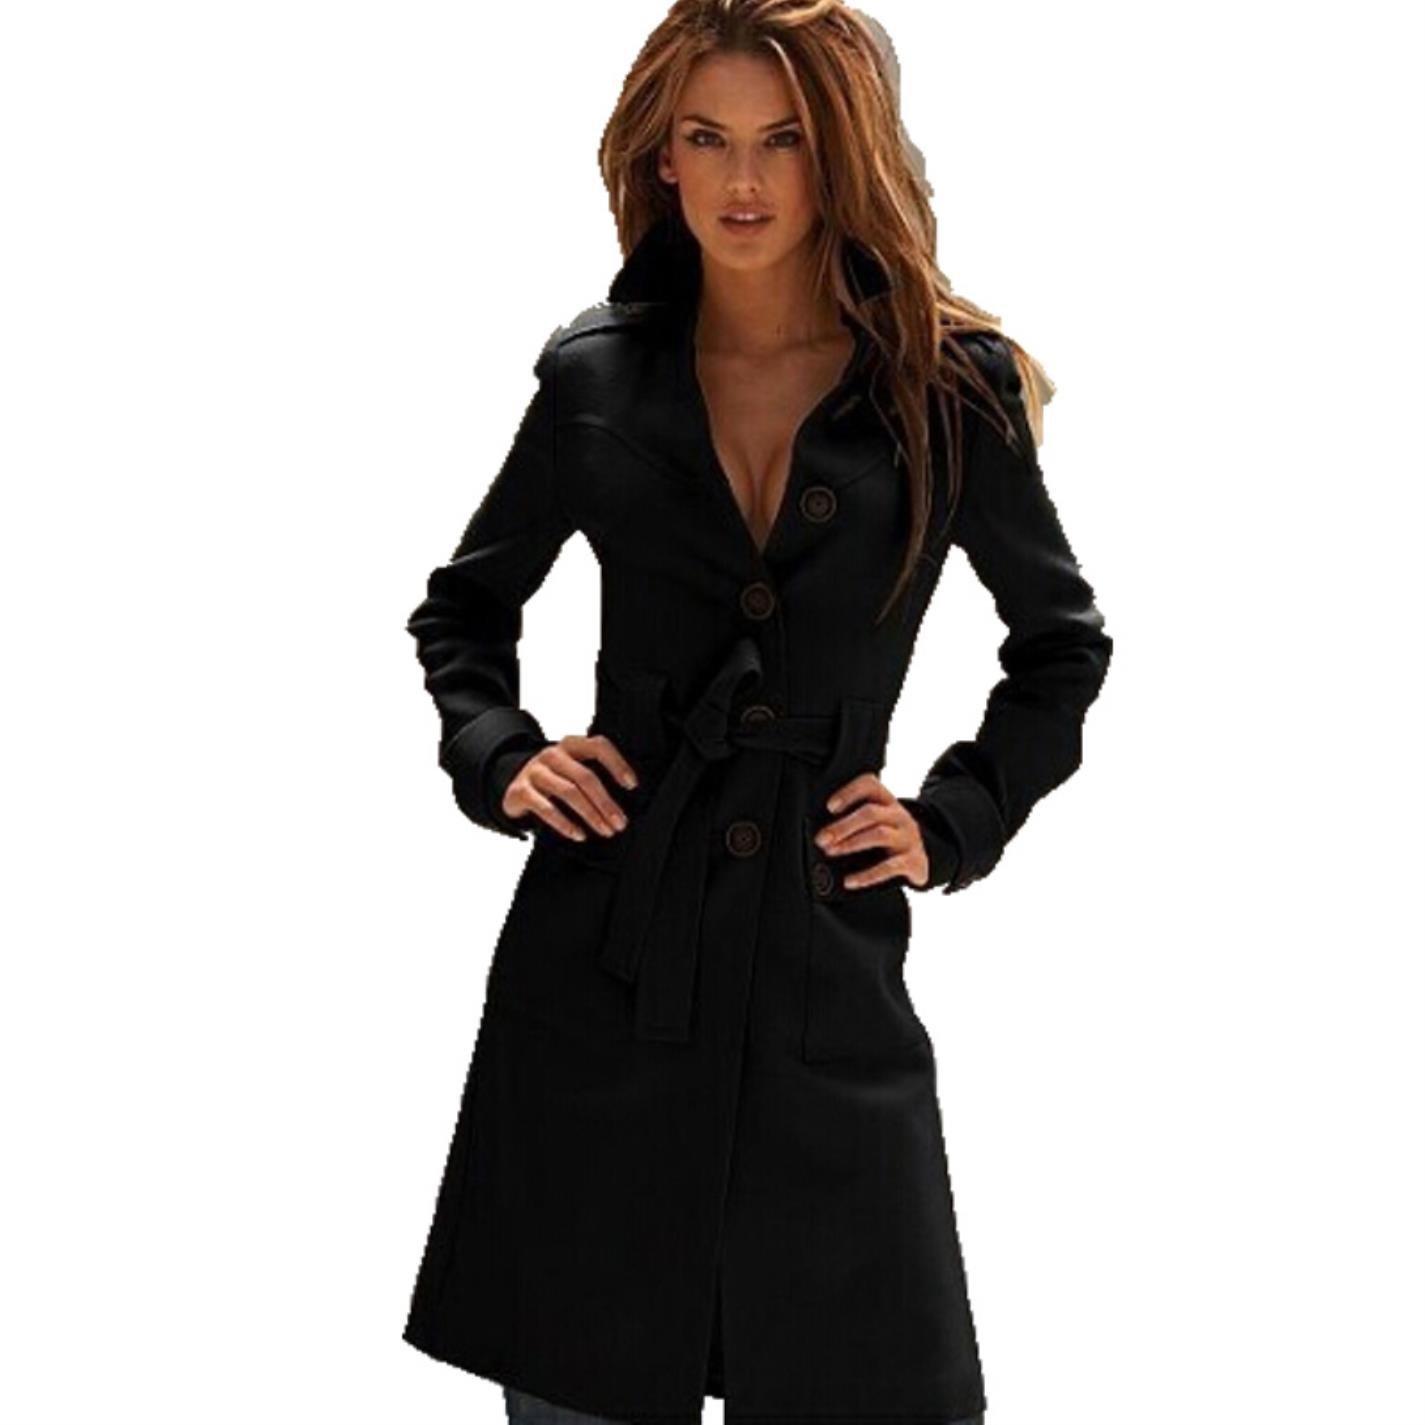 Black ZNaKa Women's Wool Blend Overcoat Single Breasted Long Trench Coat